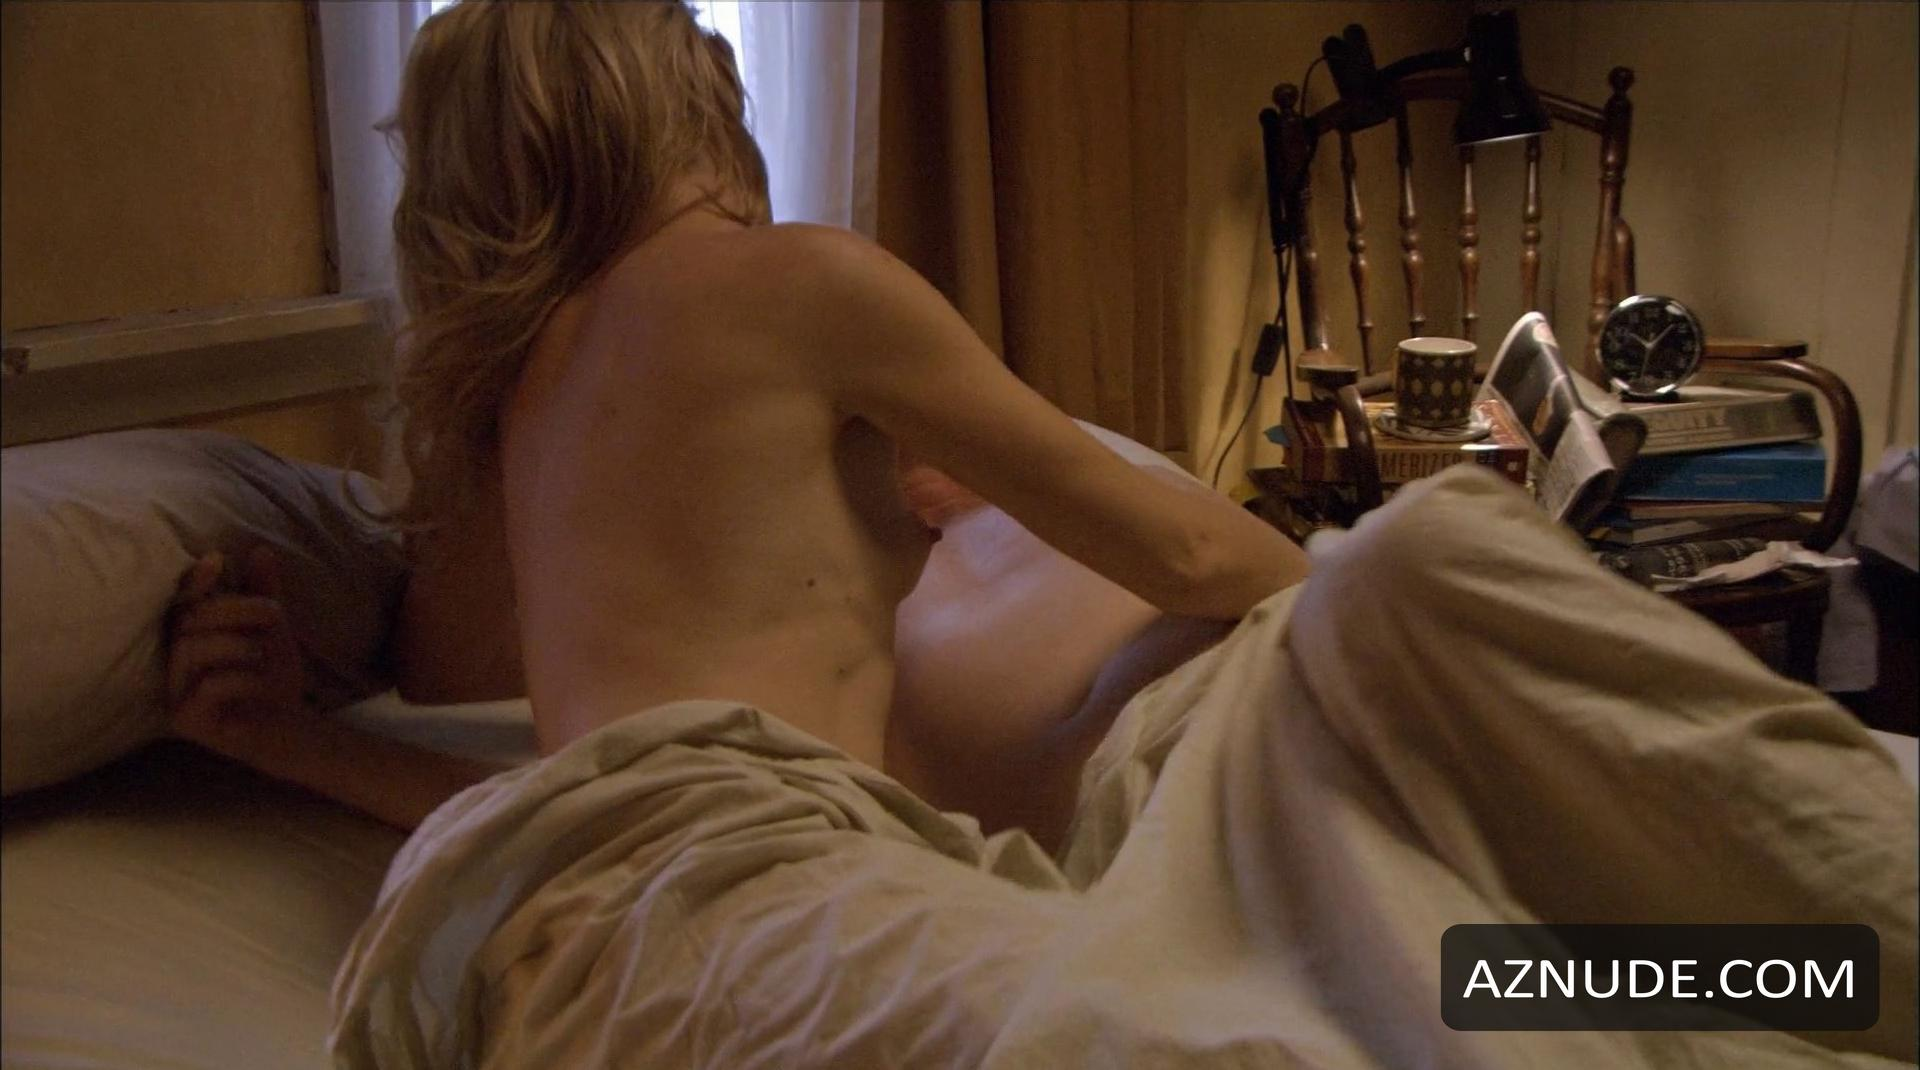 Nude pics of jessica alba